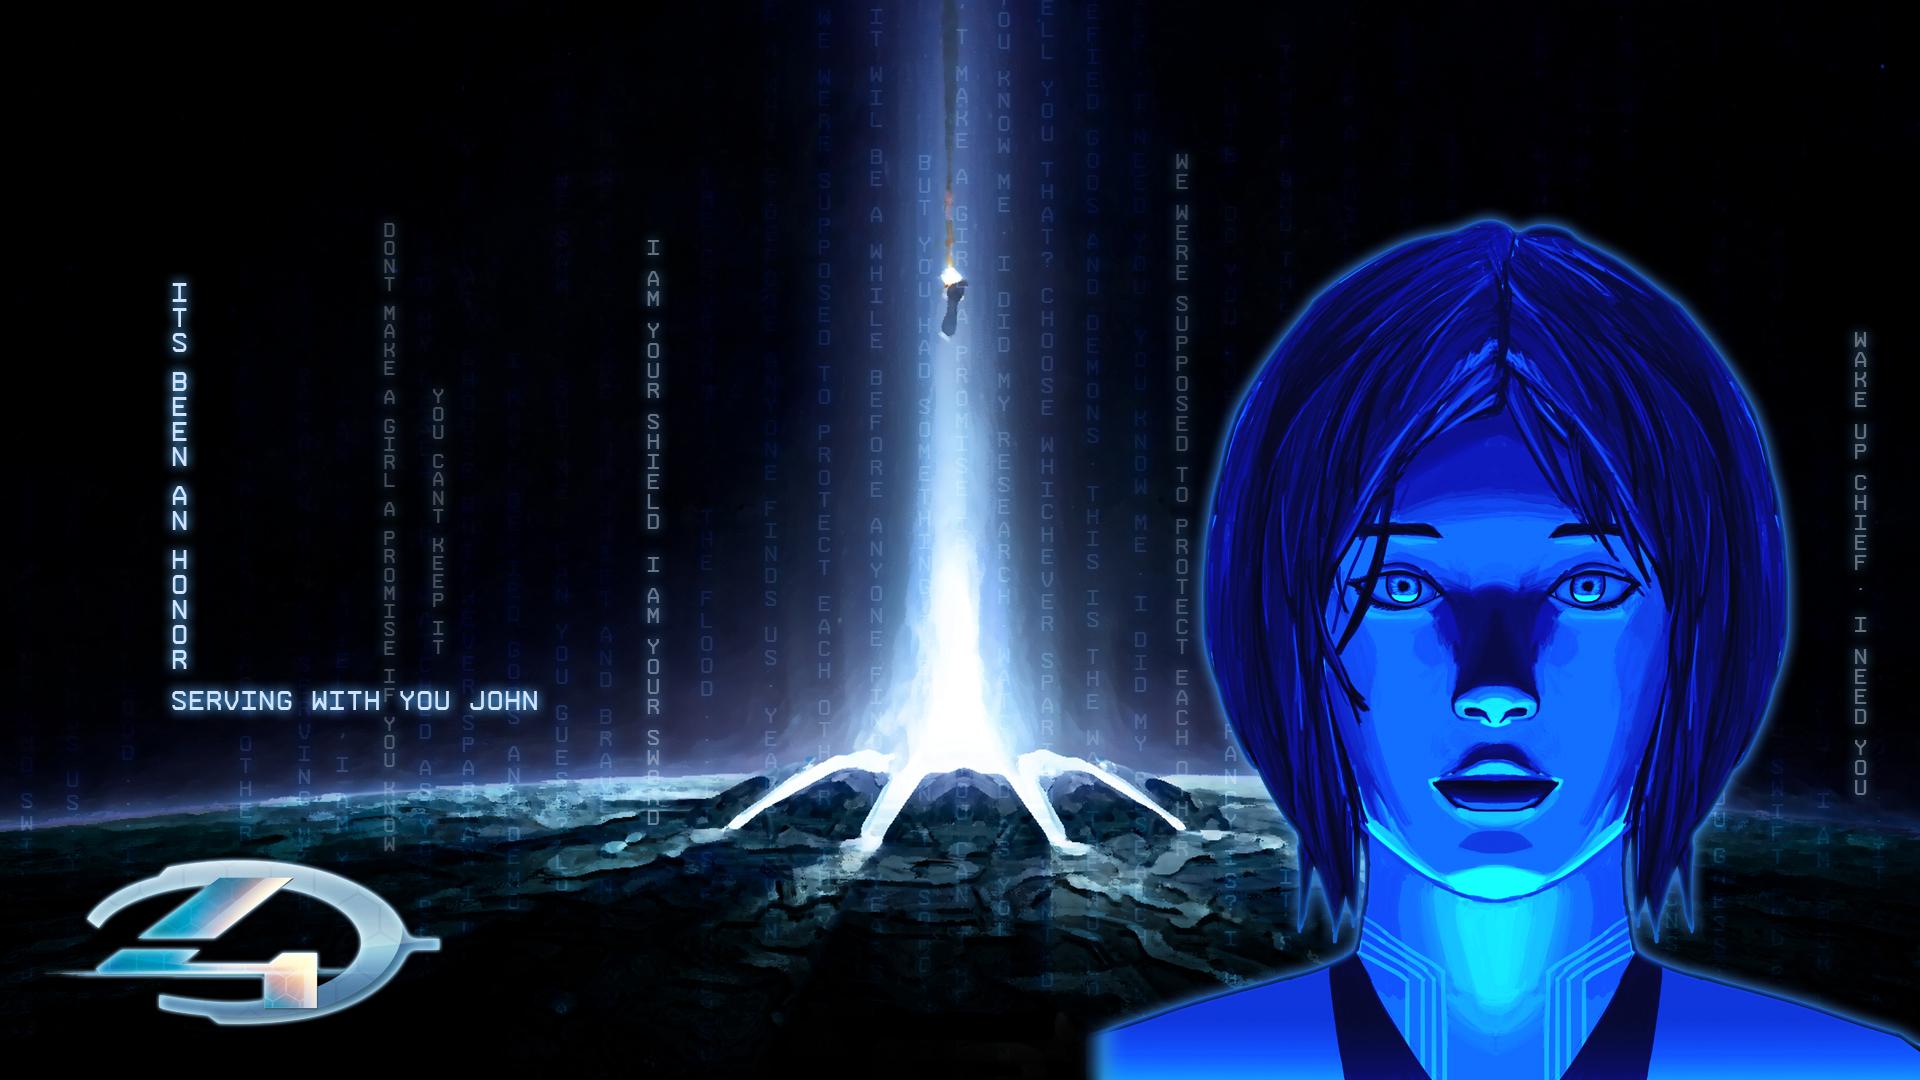 Halo 4 Cortana by IceNinjaX77 1920x1080